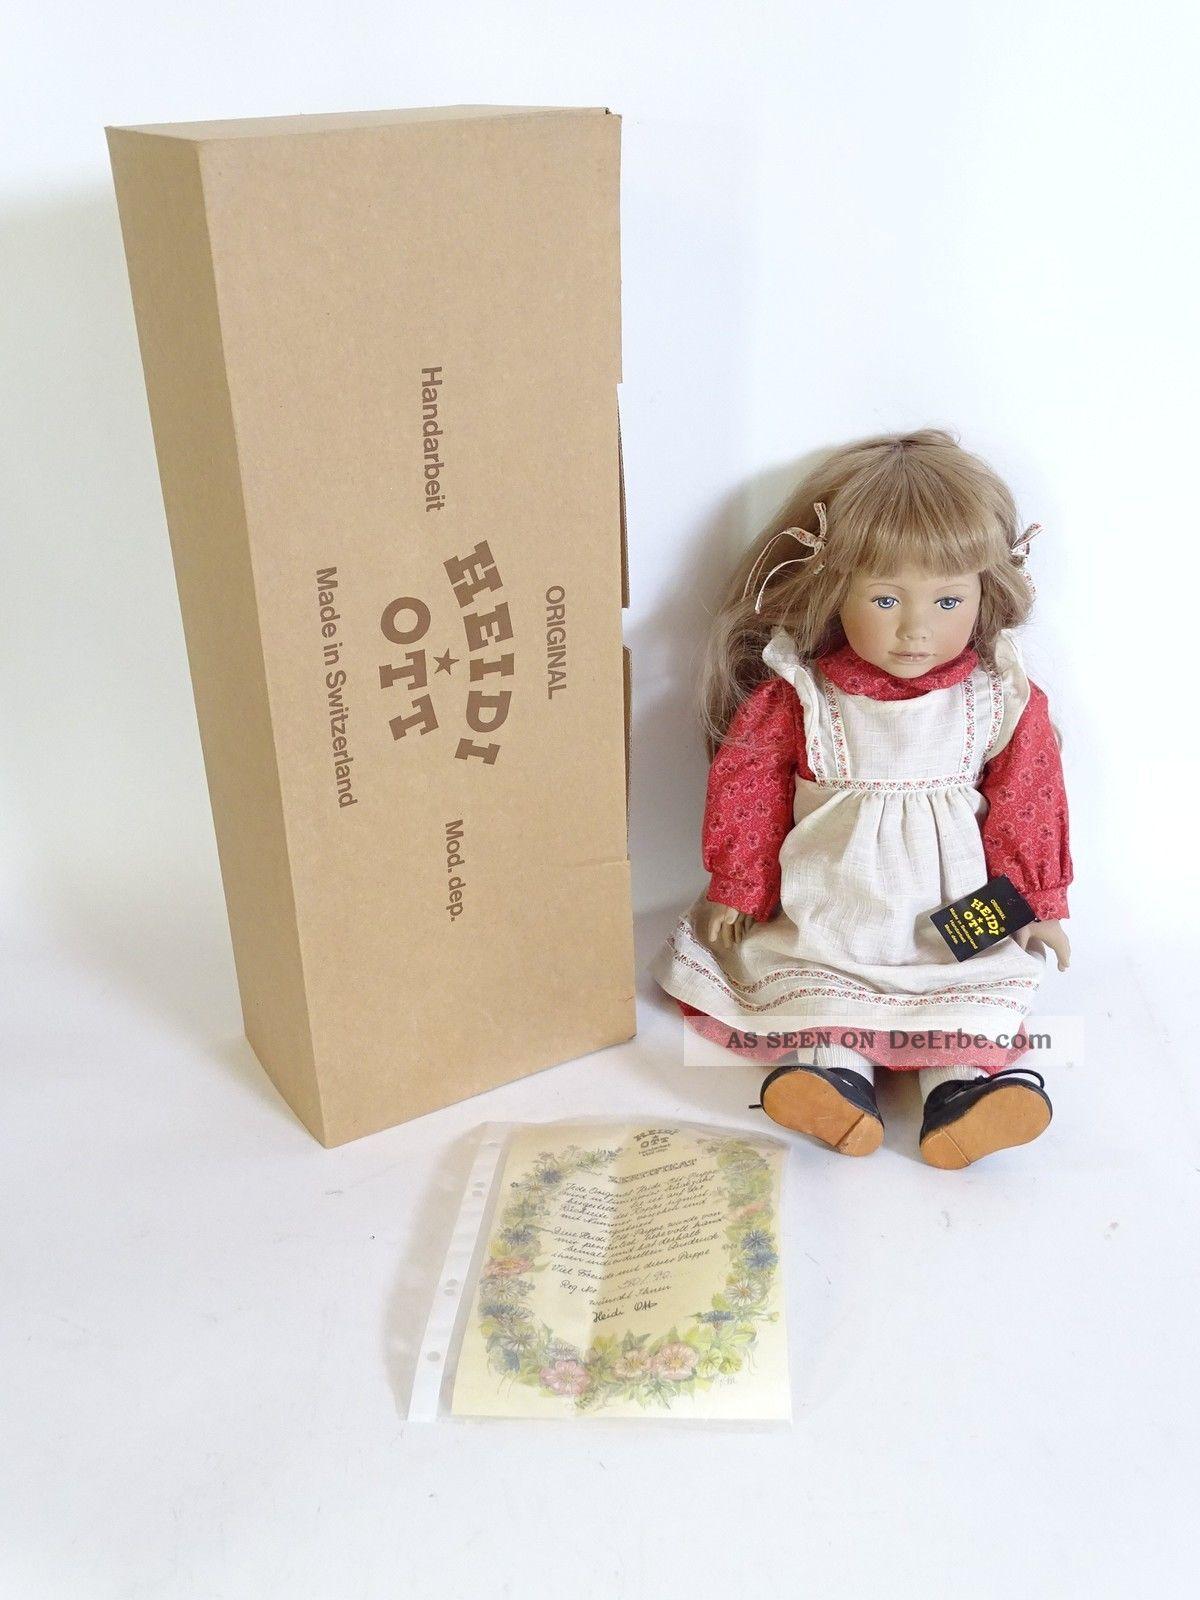 Signierte Heidi Ott Puppe Reg Nr.  50/90 Handbemalt Limitiert Zertifika Porzellankopfpuppen Bild